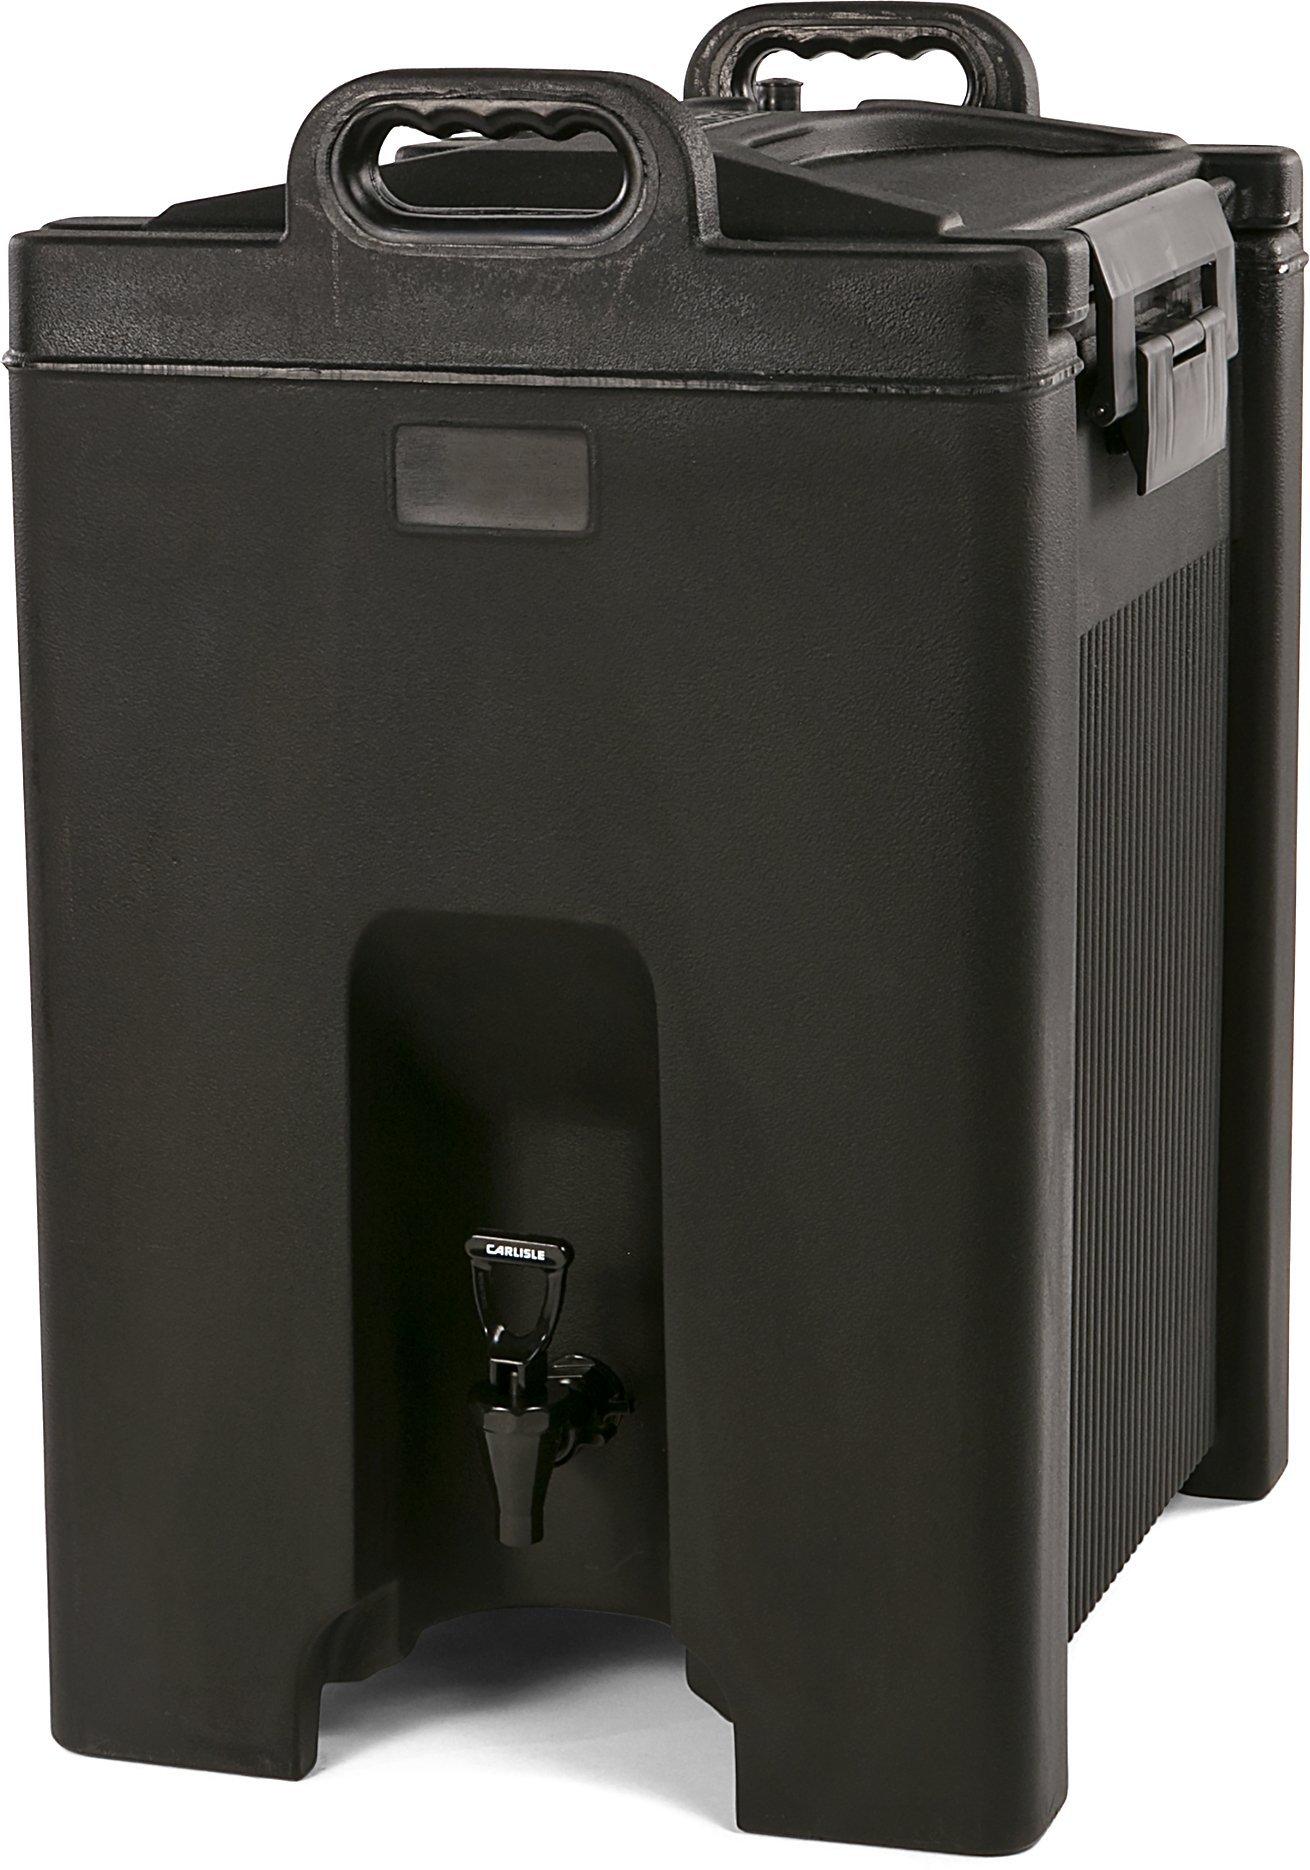 Carlisle XT1000003 Cateraide Insulated Beverage Server Dispenser, 10 Gallon, Black